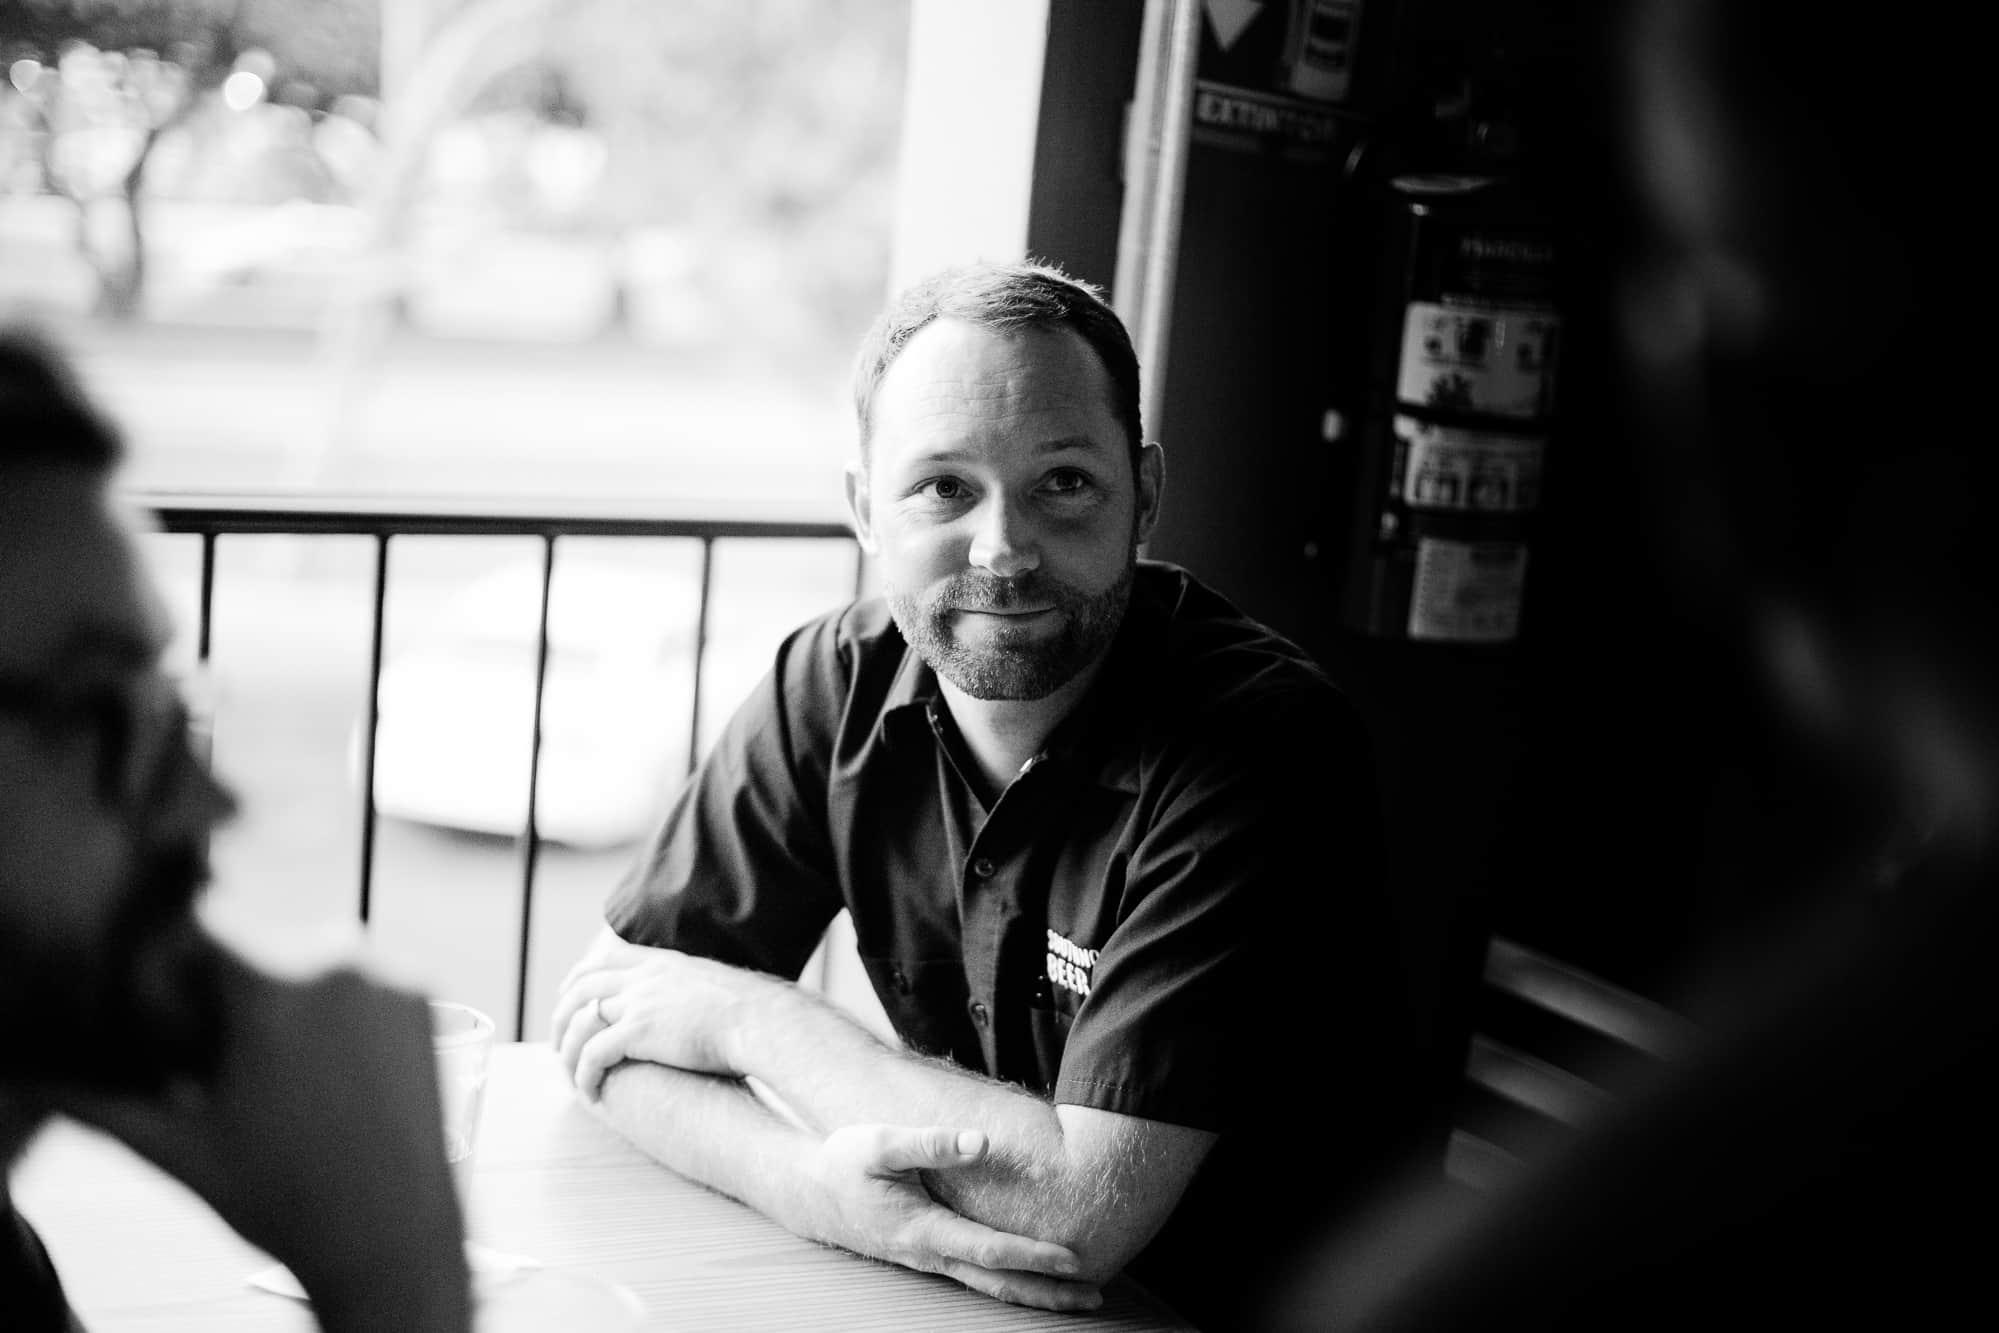 Brewmaster, Ryan Brooks